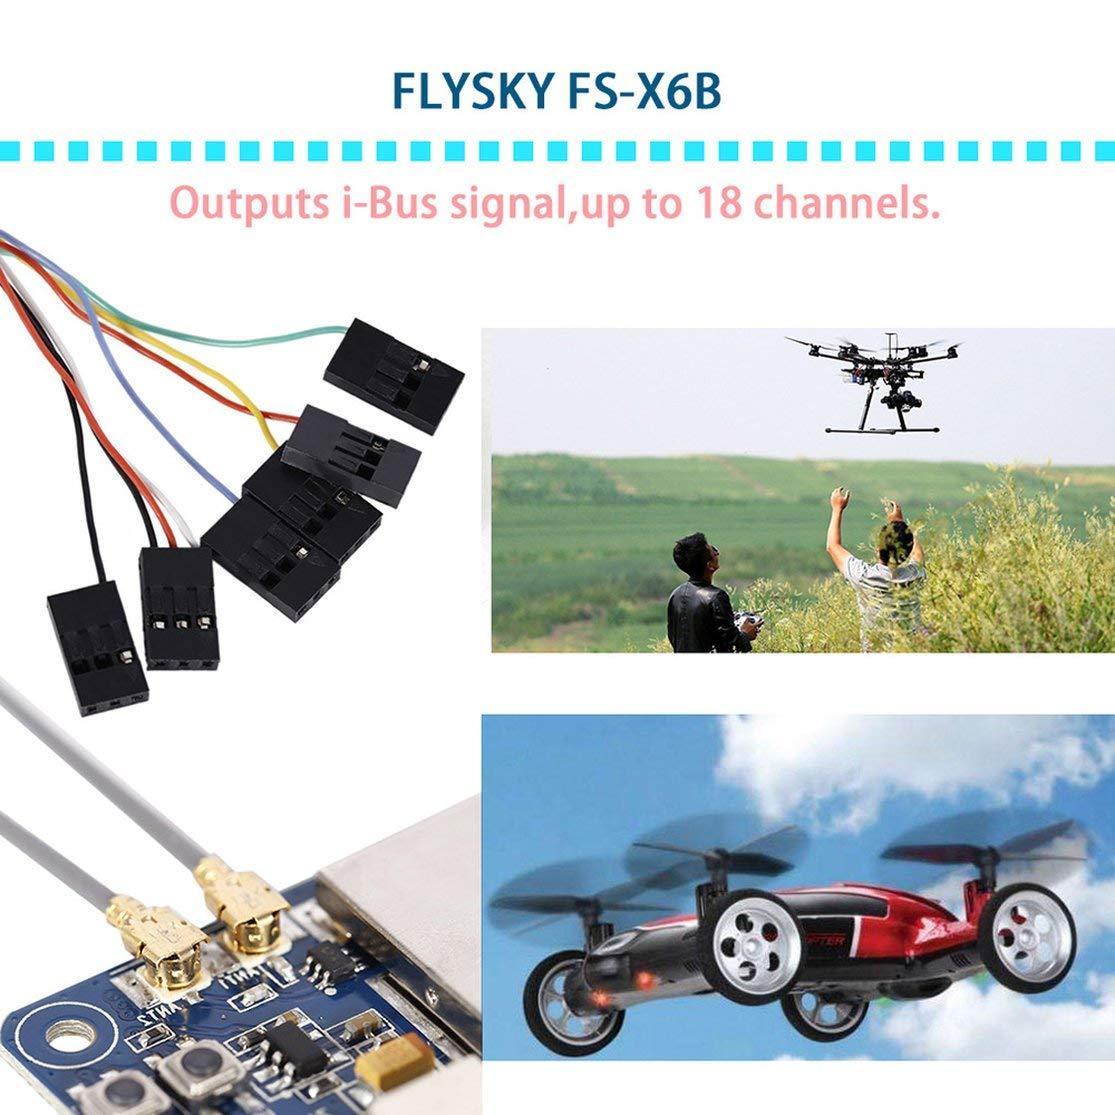 Candybarbar Receptor FS X6B para transmisor del Sistema Flysky AFHDS 2A 2.4G 18 Canales con Interfaz de Sensor de Voltaje Peso Ligero